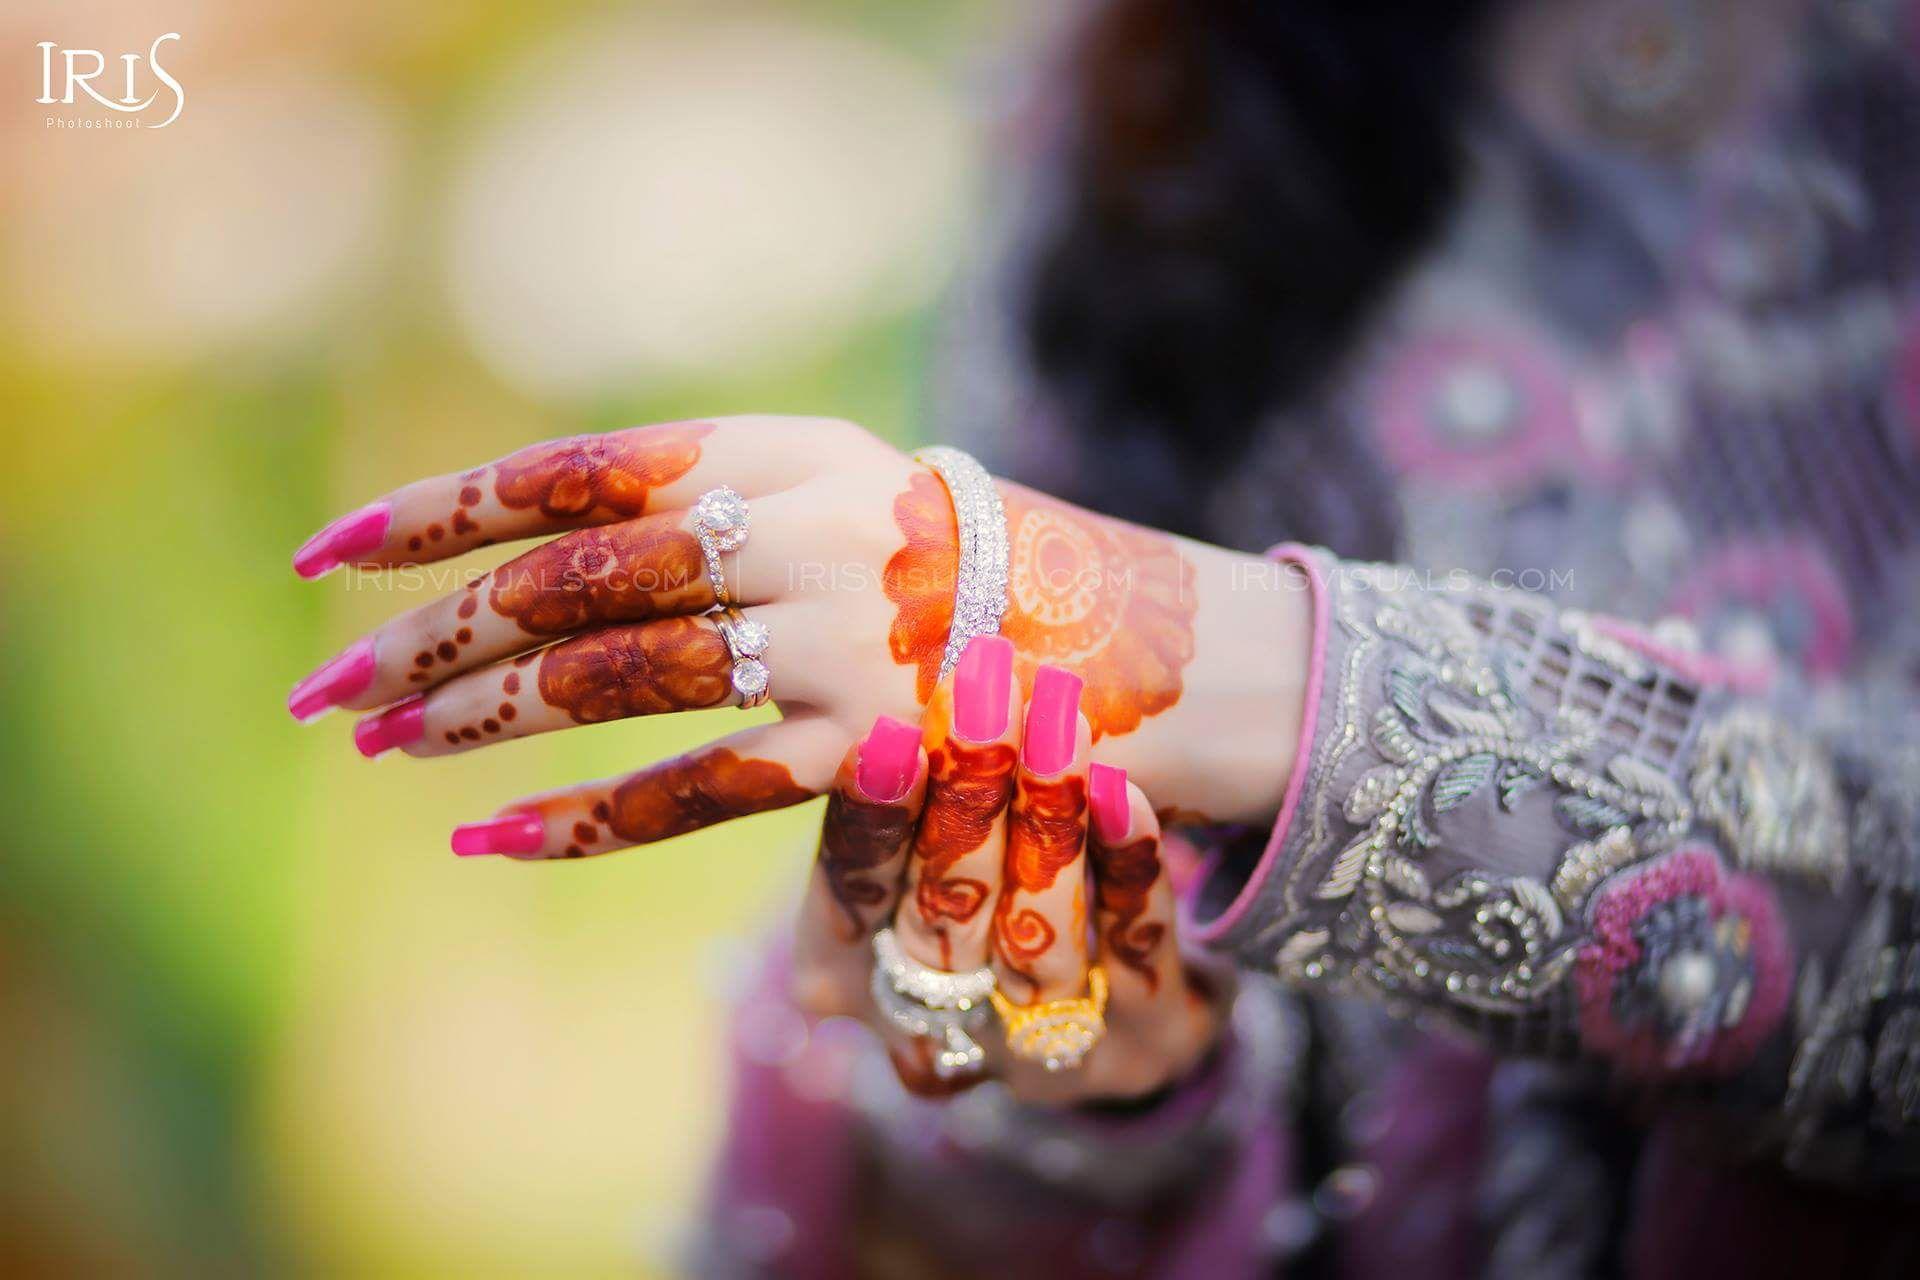 Pin mehndi and bangles display pics awesome dp wallpaper on pinterest - Iris Photography